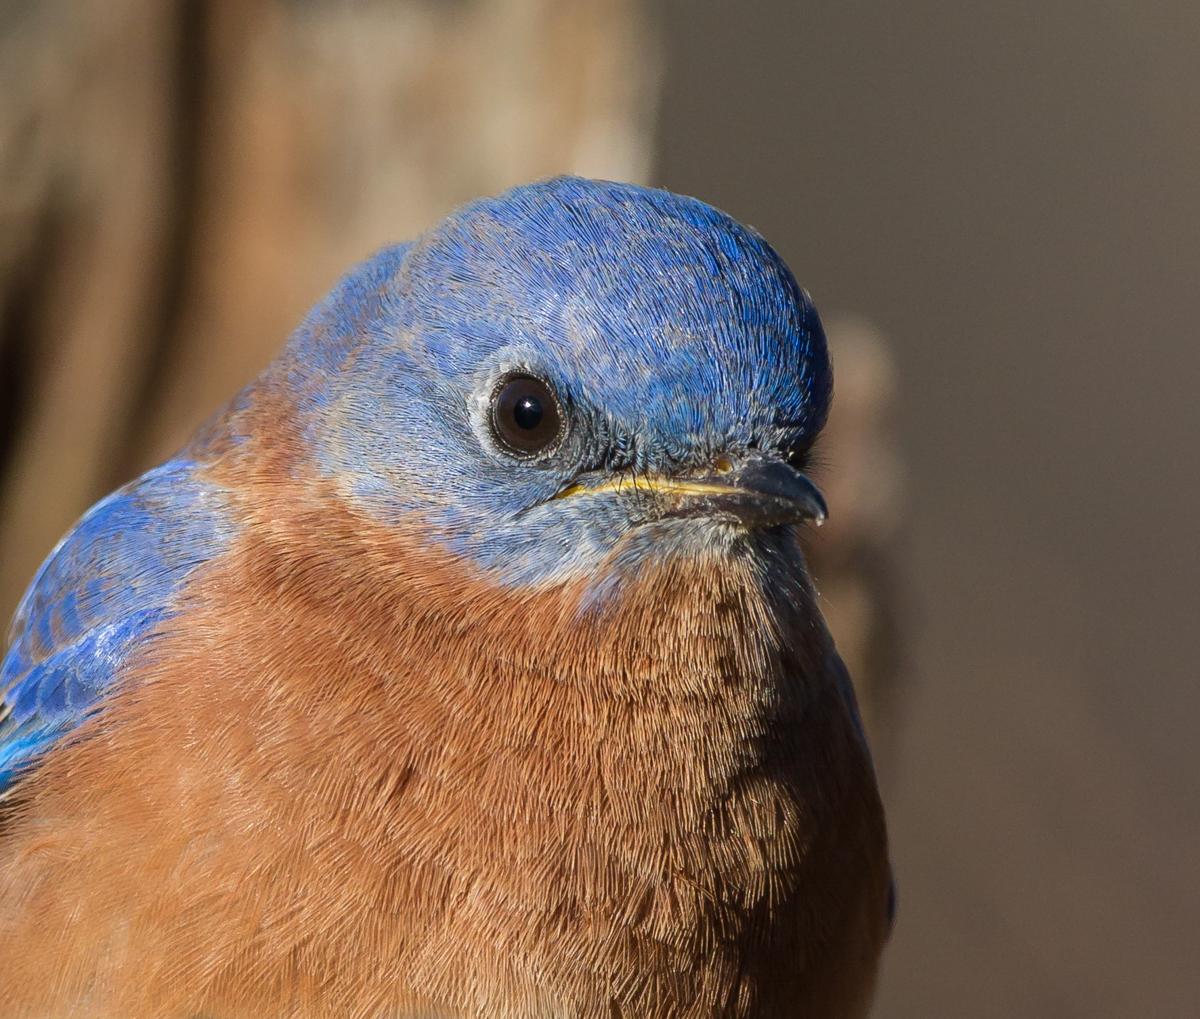 Blue bird comics best bird 2018 blessing from the bluebird symbolic meanings by avia biocorpaavc